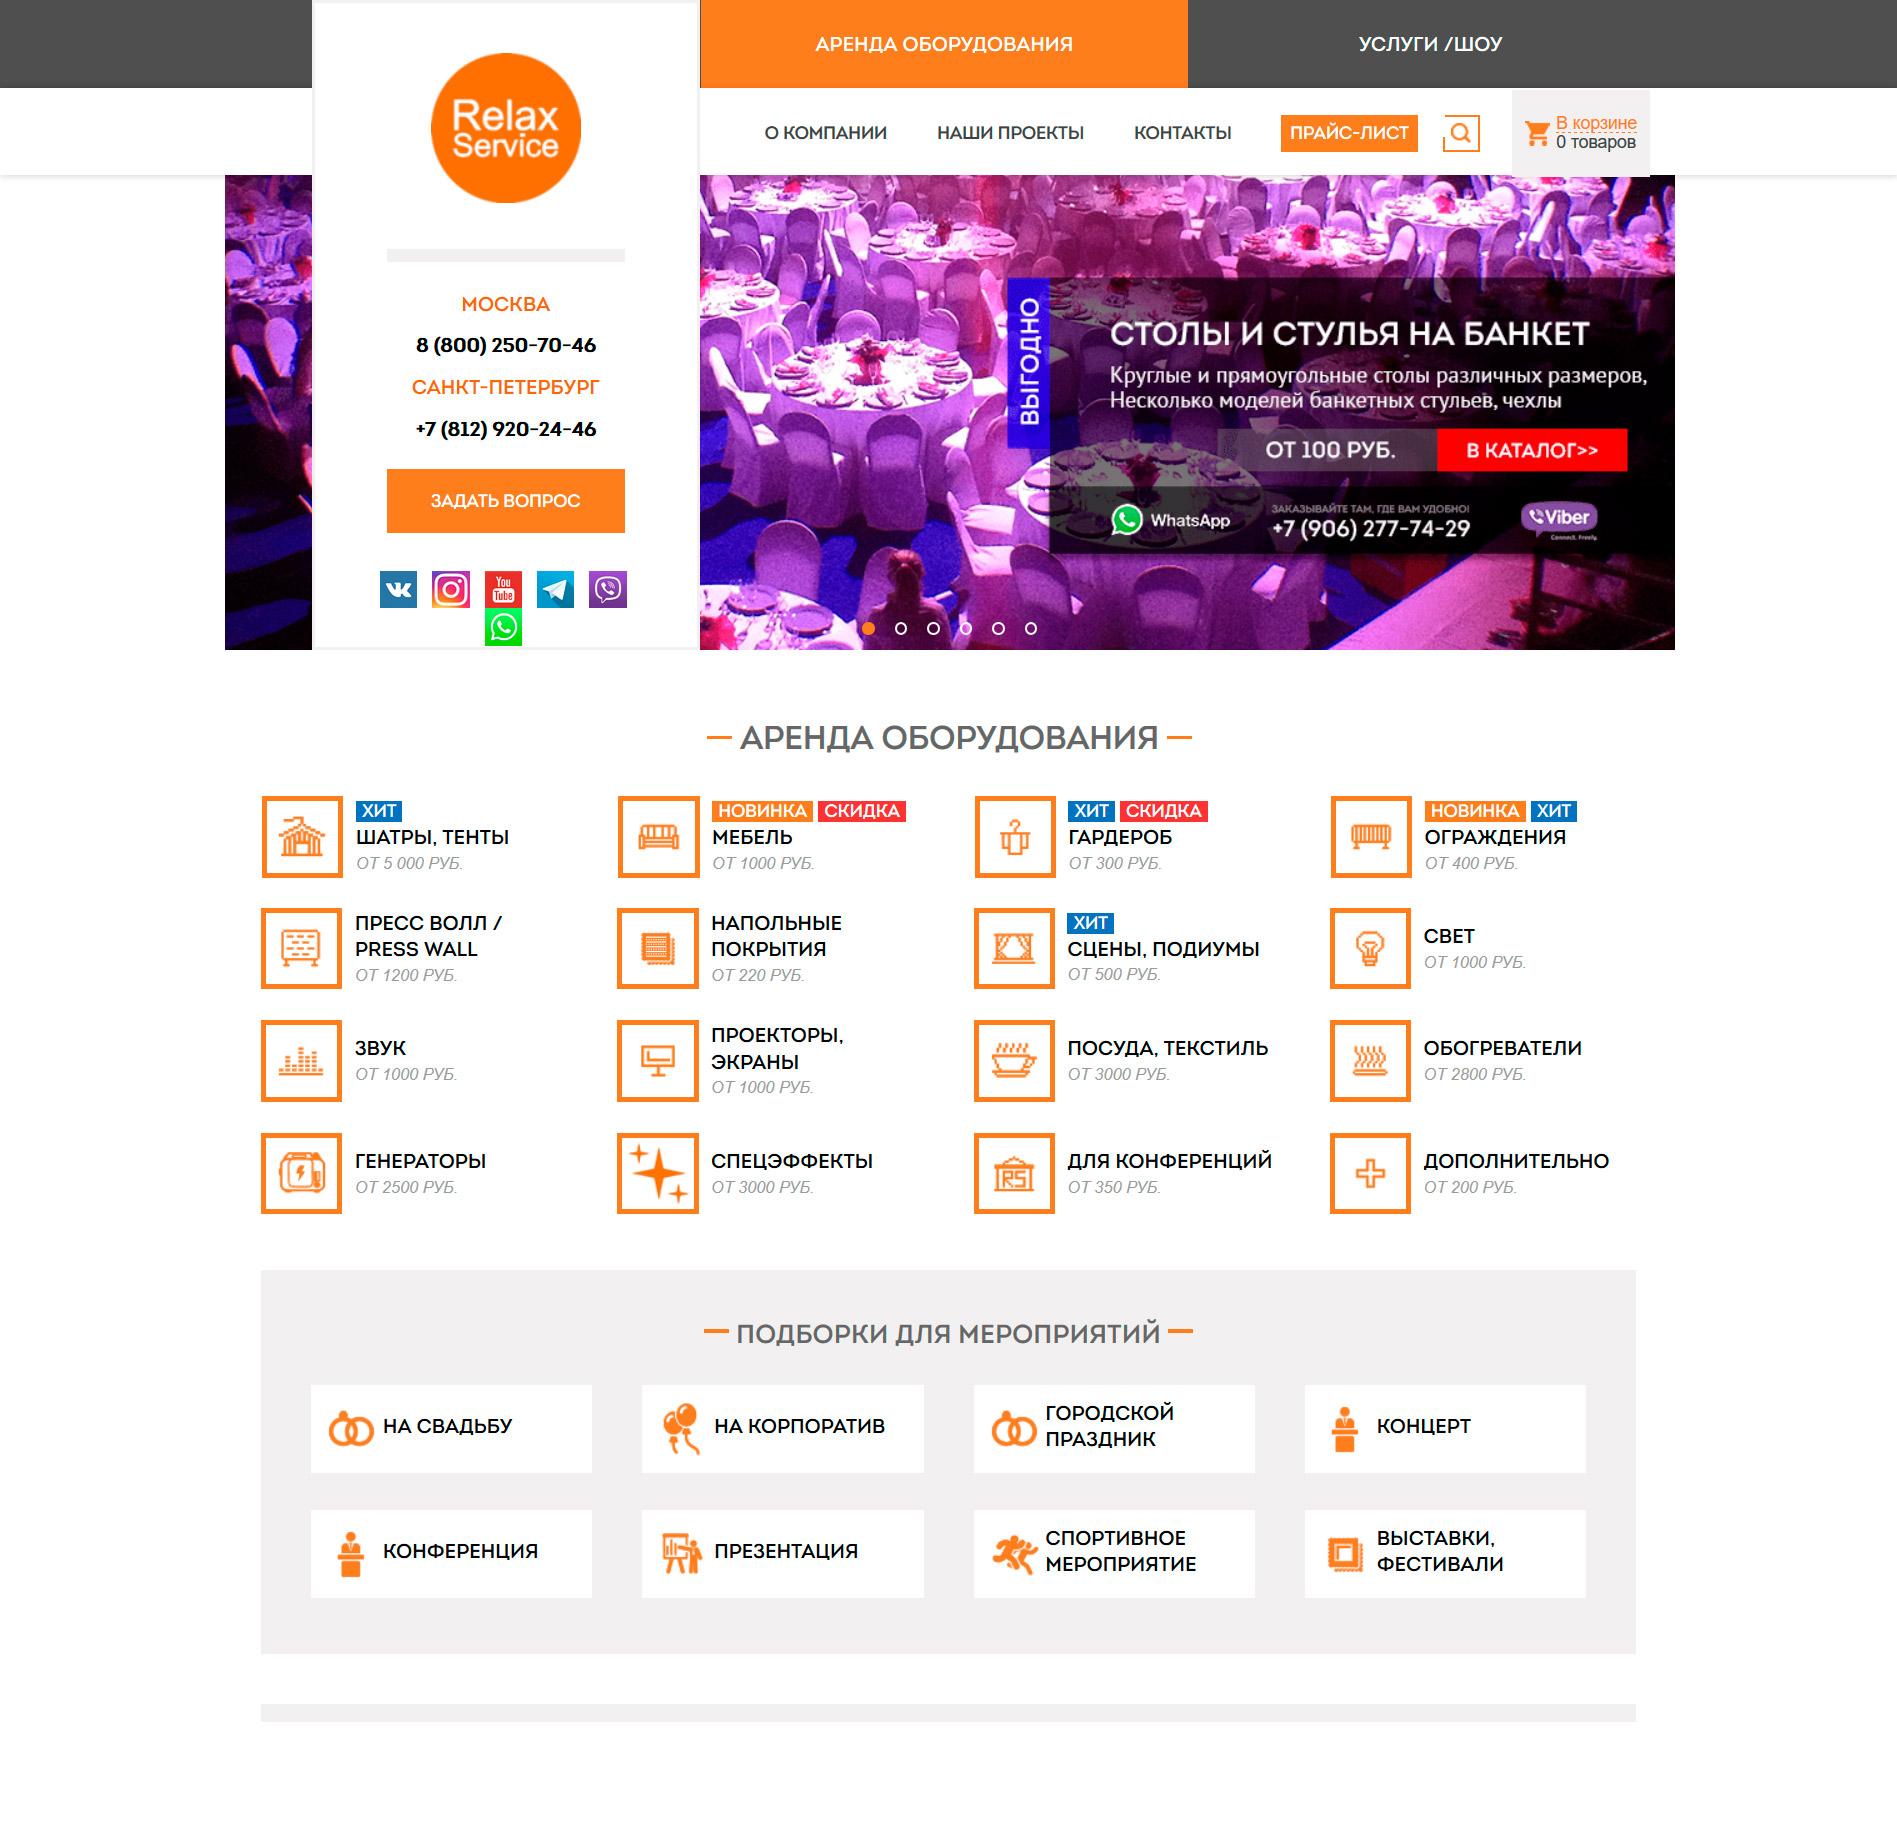 Прокатная фирма Relax Service (Wordpress)